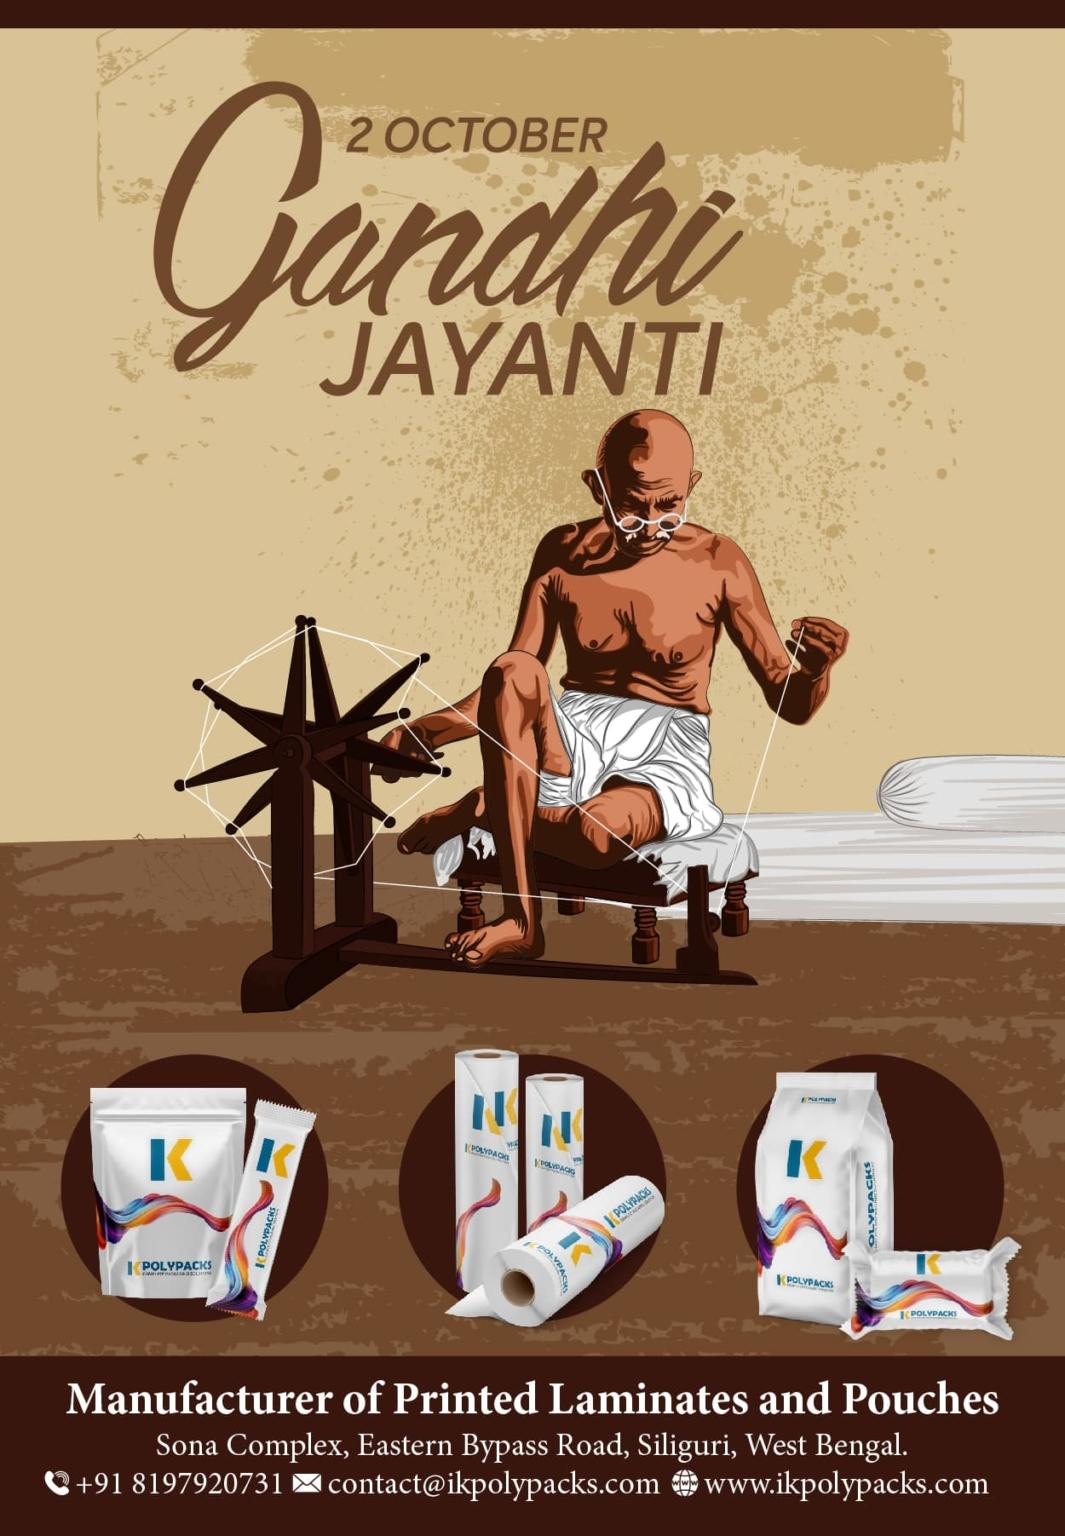 Gandhi Jayanti 02 - Season Greetings 500